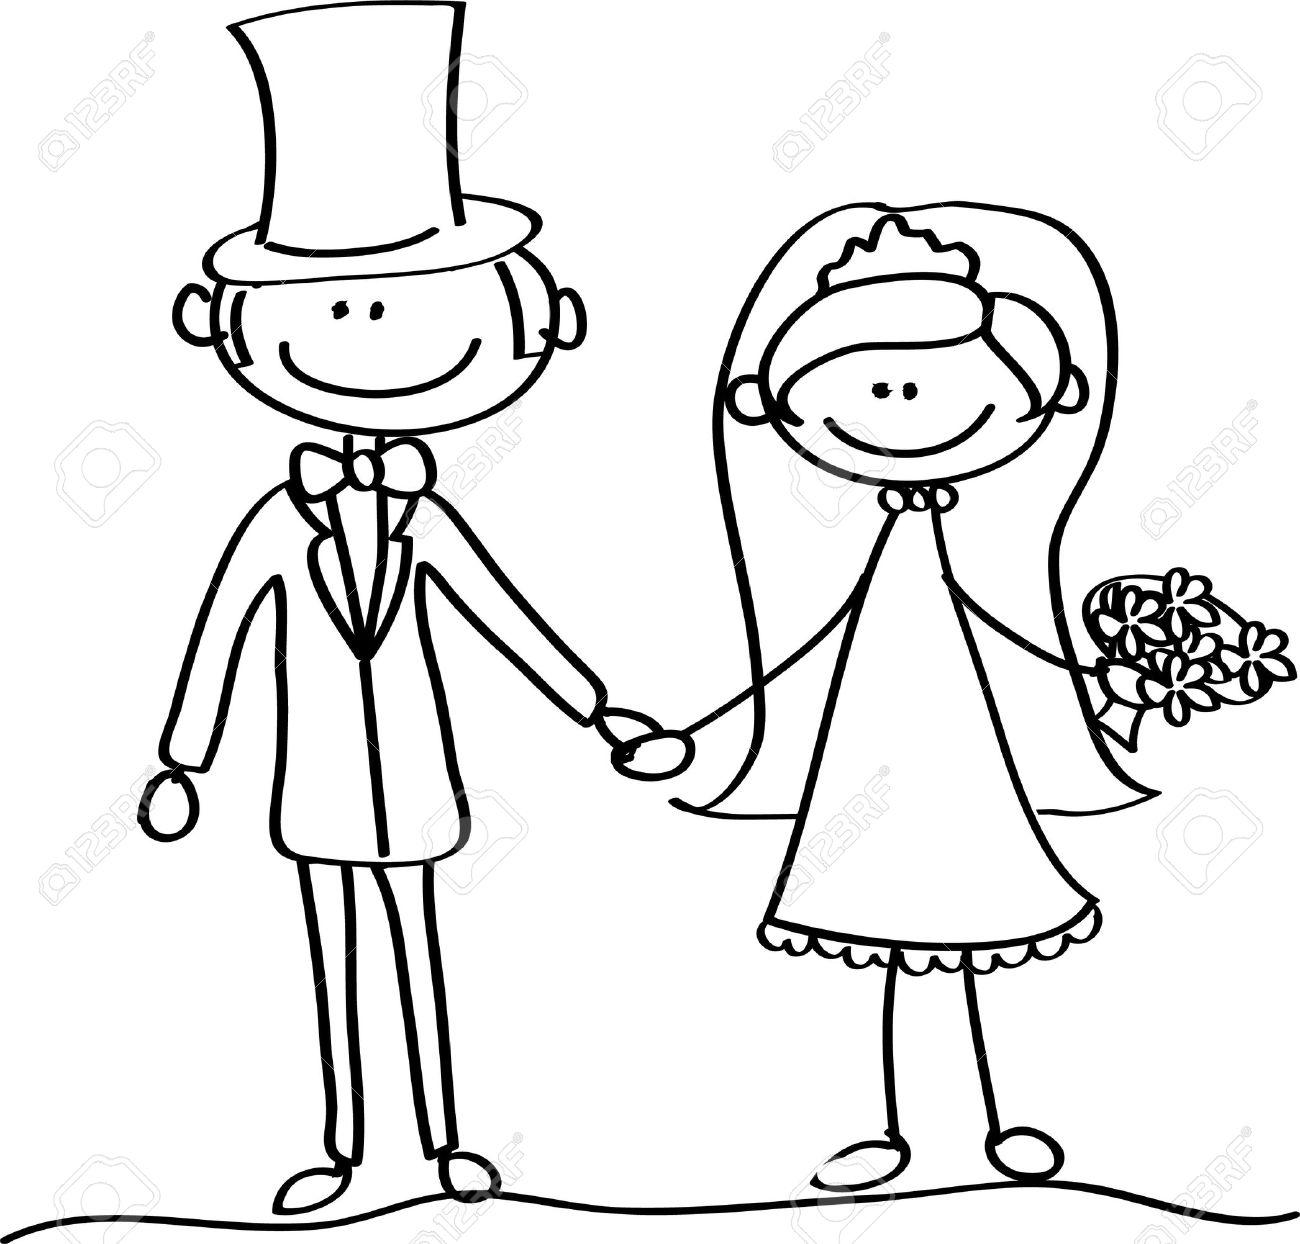 bride grabbing groom clipart 20 free Cliparts | Download ...